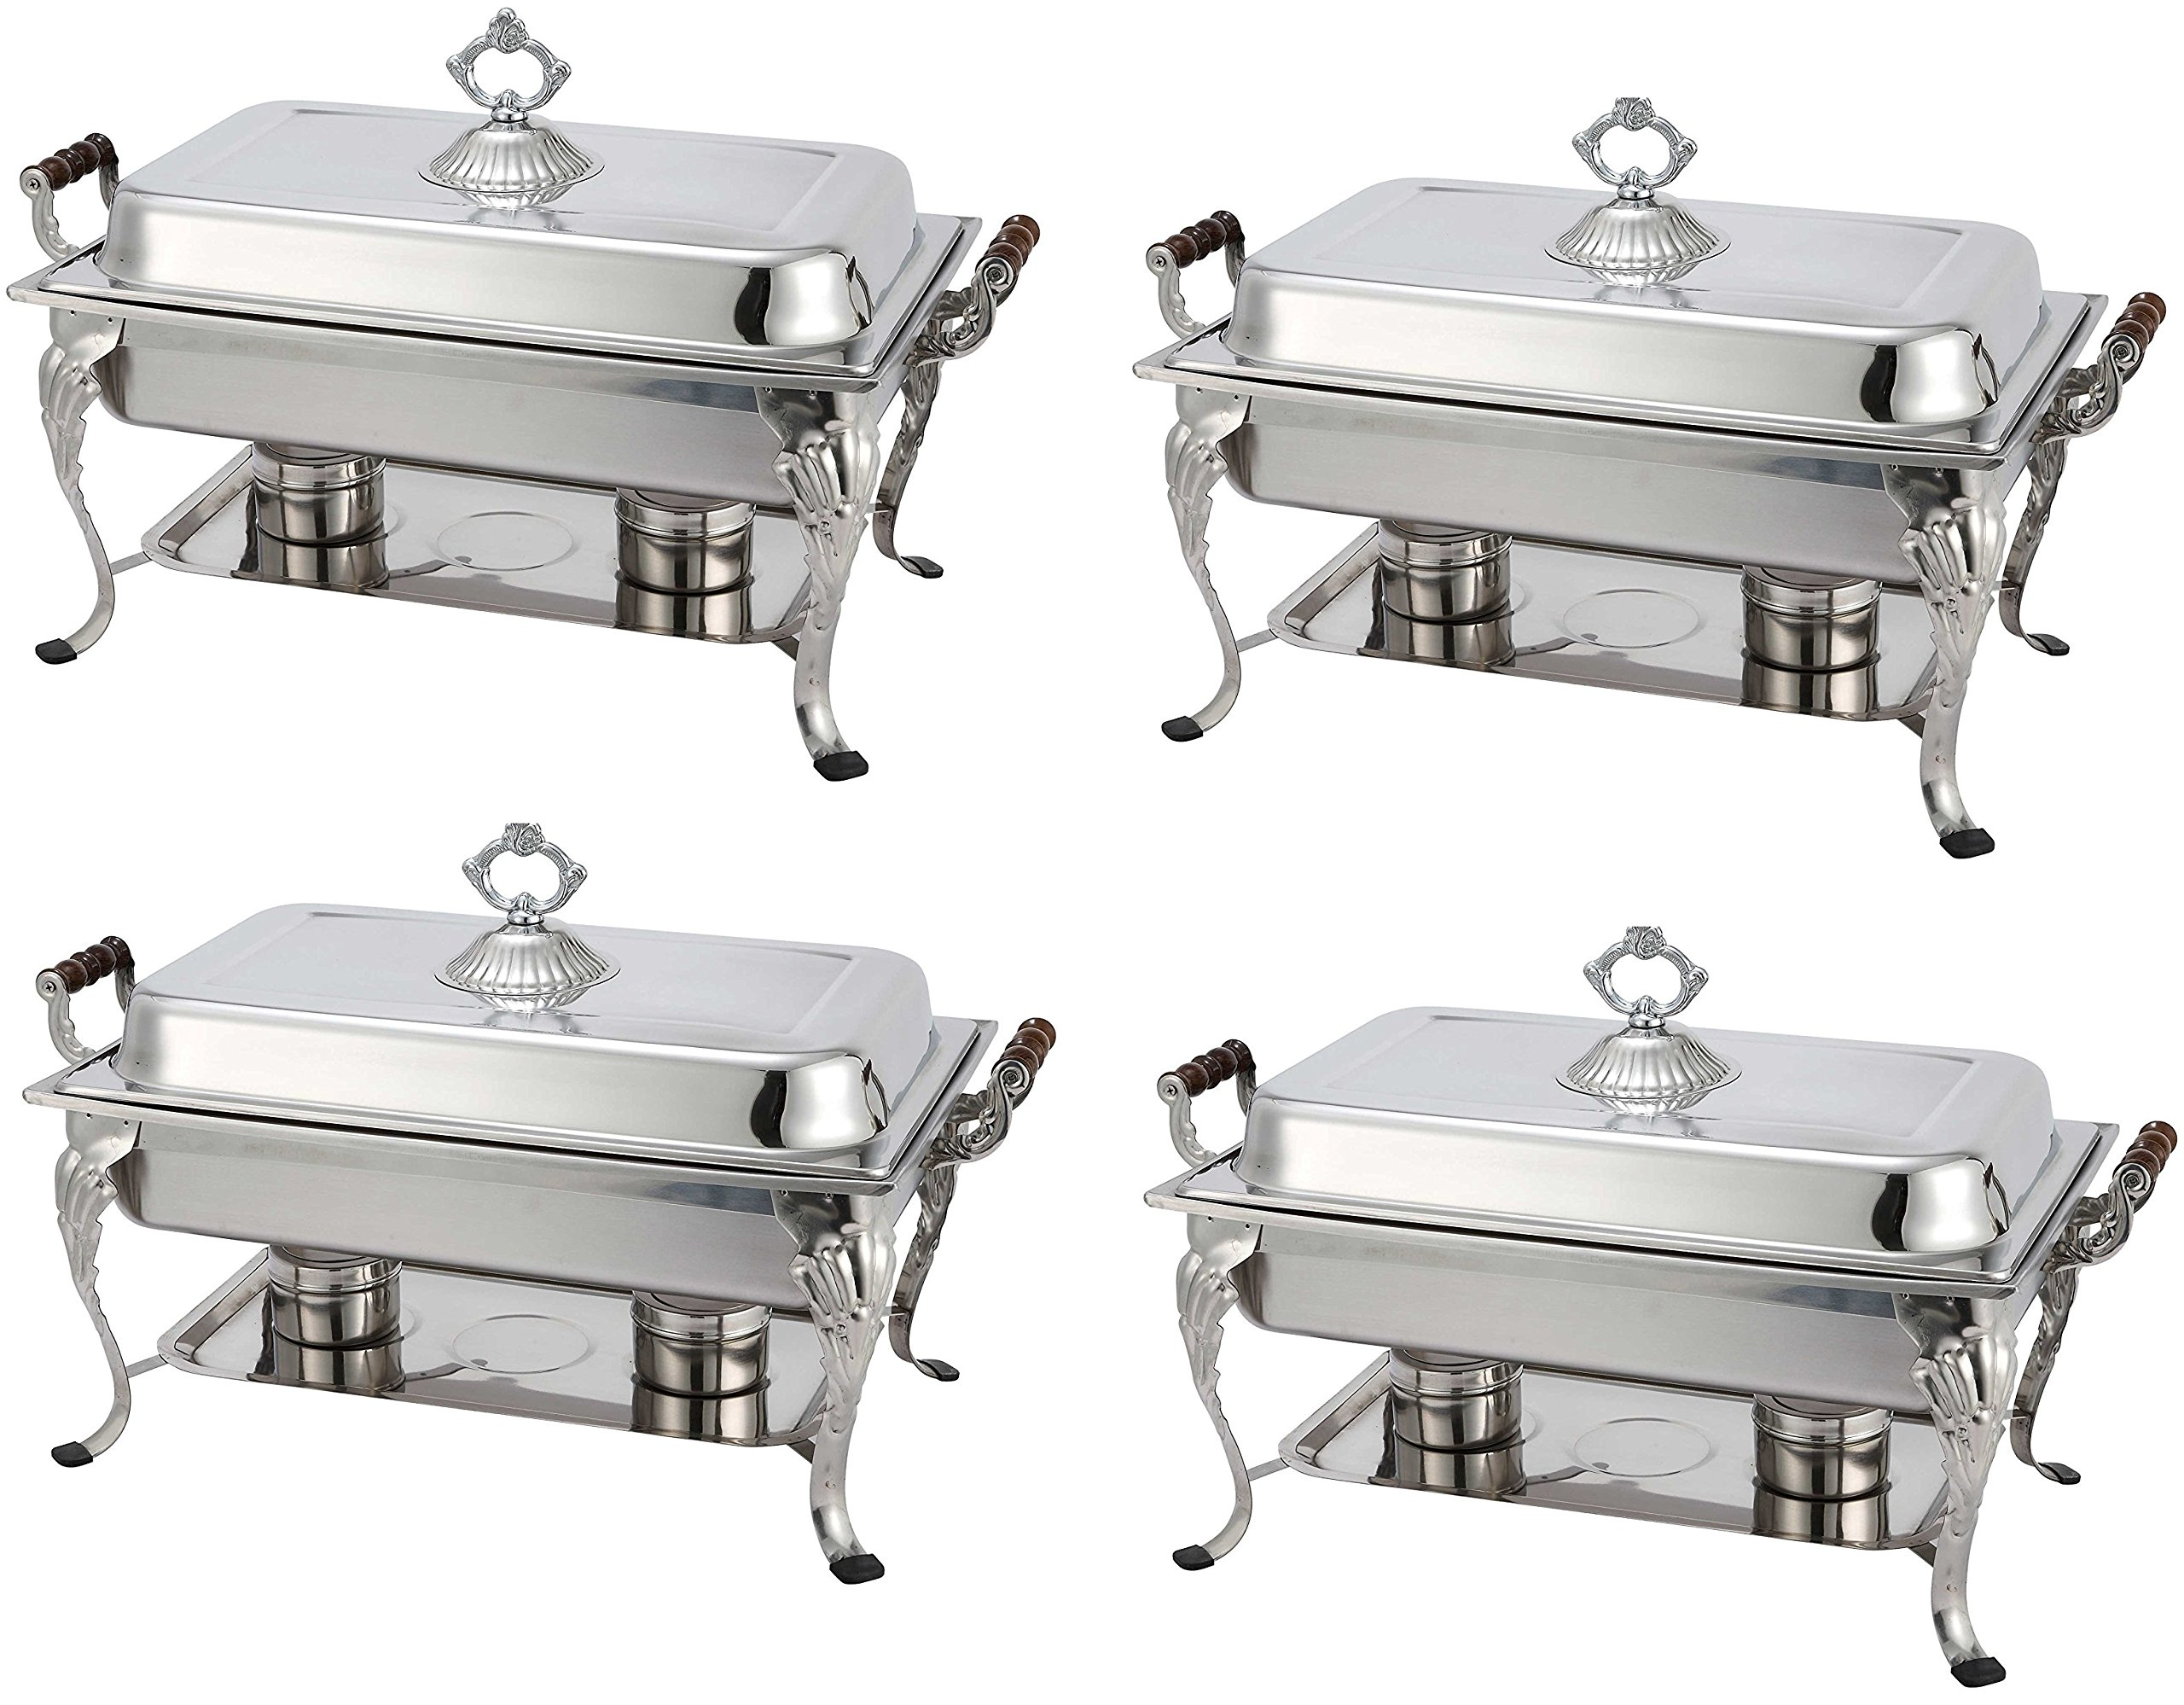 4 Pack Royal Rectangular Crown Chafing Dish Sets Food Warmers 8-Quart $20 Rebate